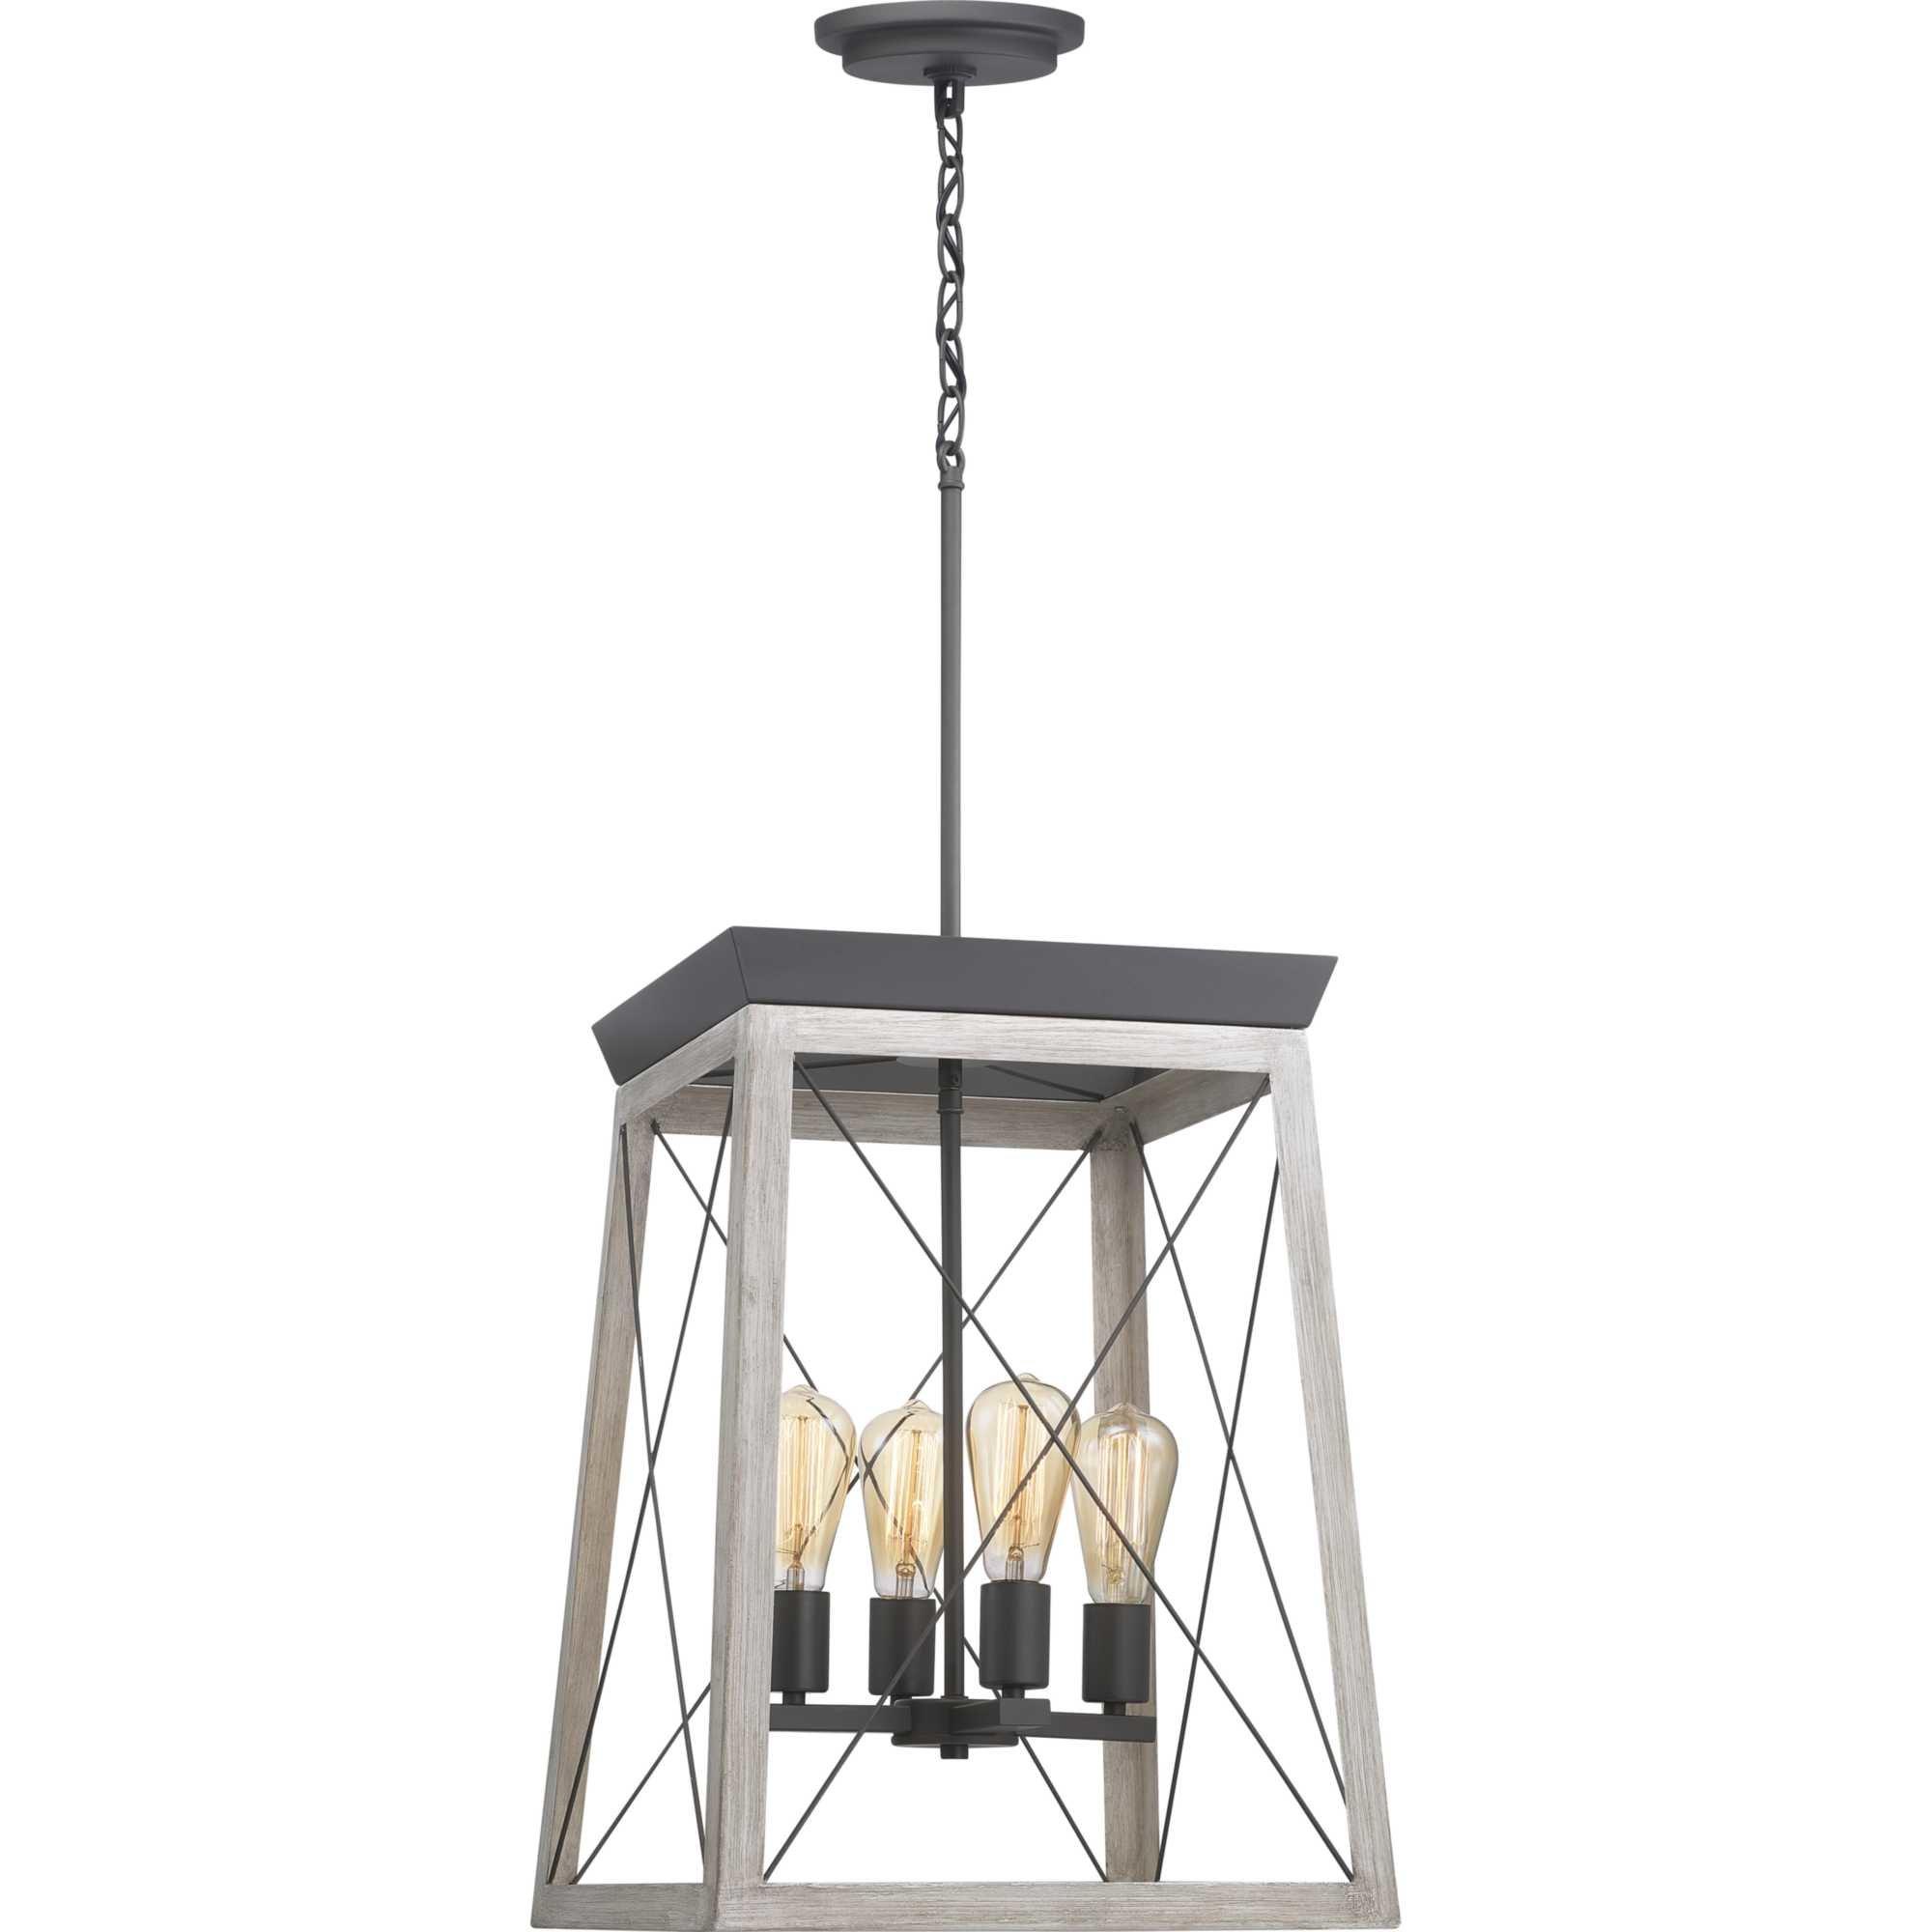 Delon 4-Light Lantern Chandelier regarding Delon 4-Light Square Chandeliers (Image 7 of 30)